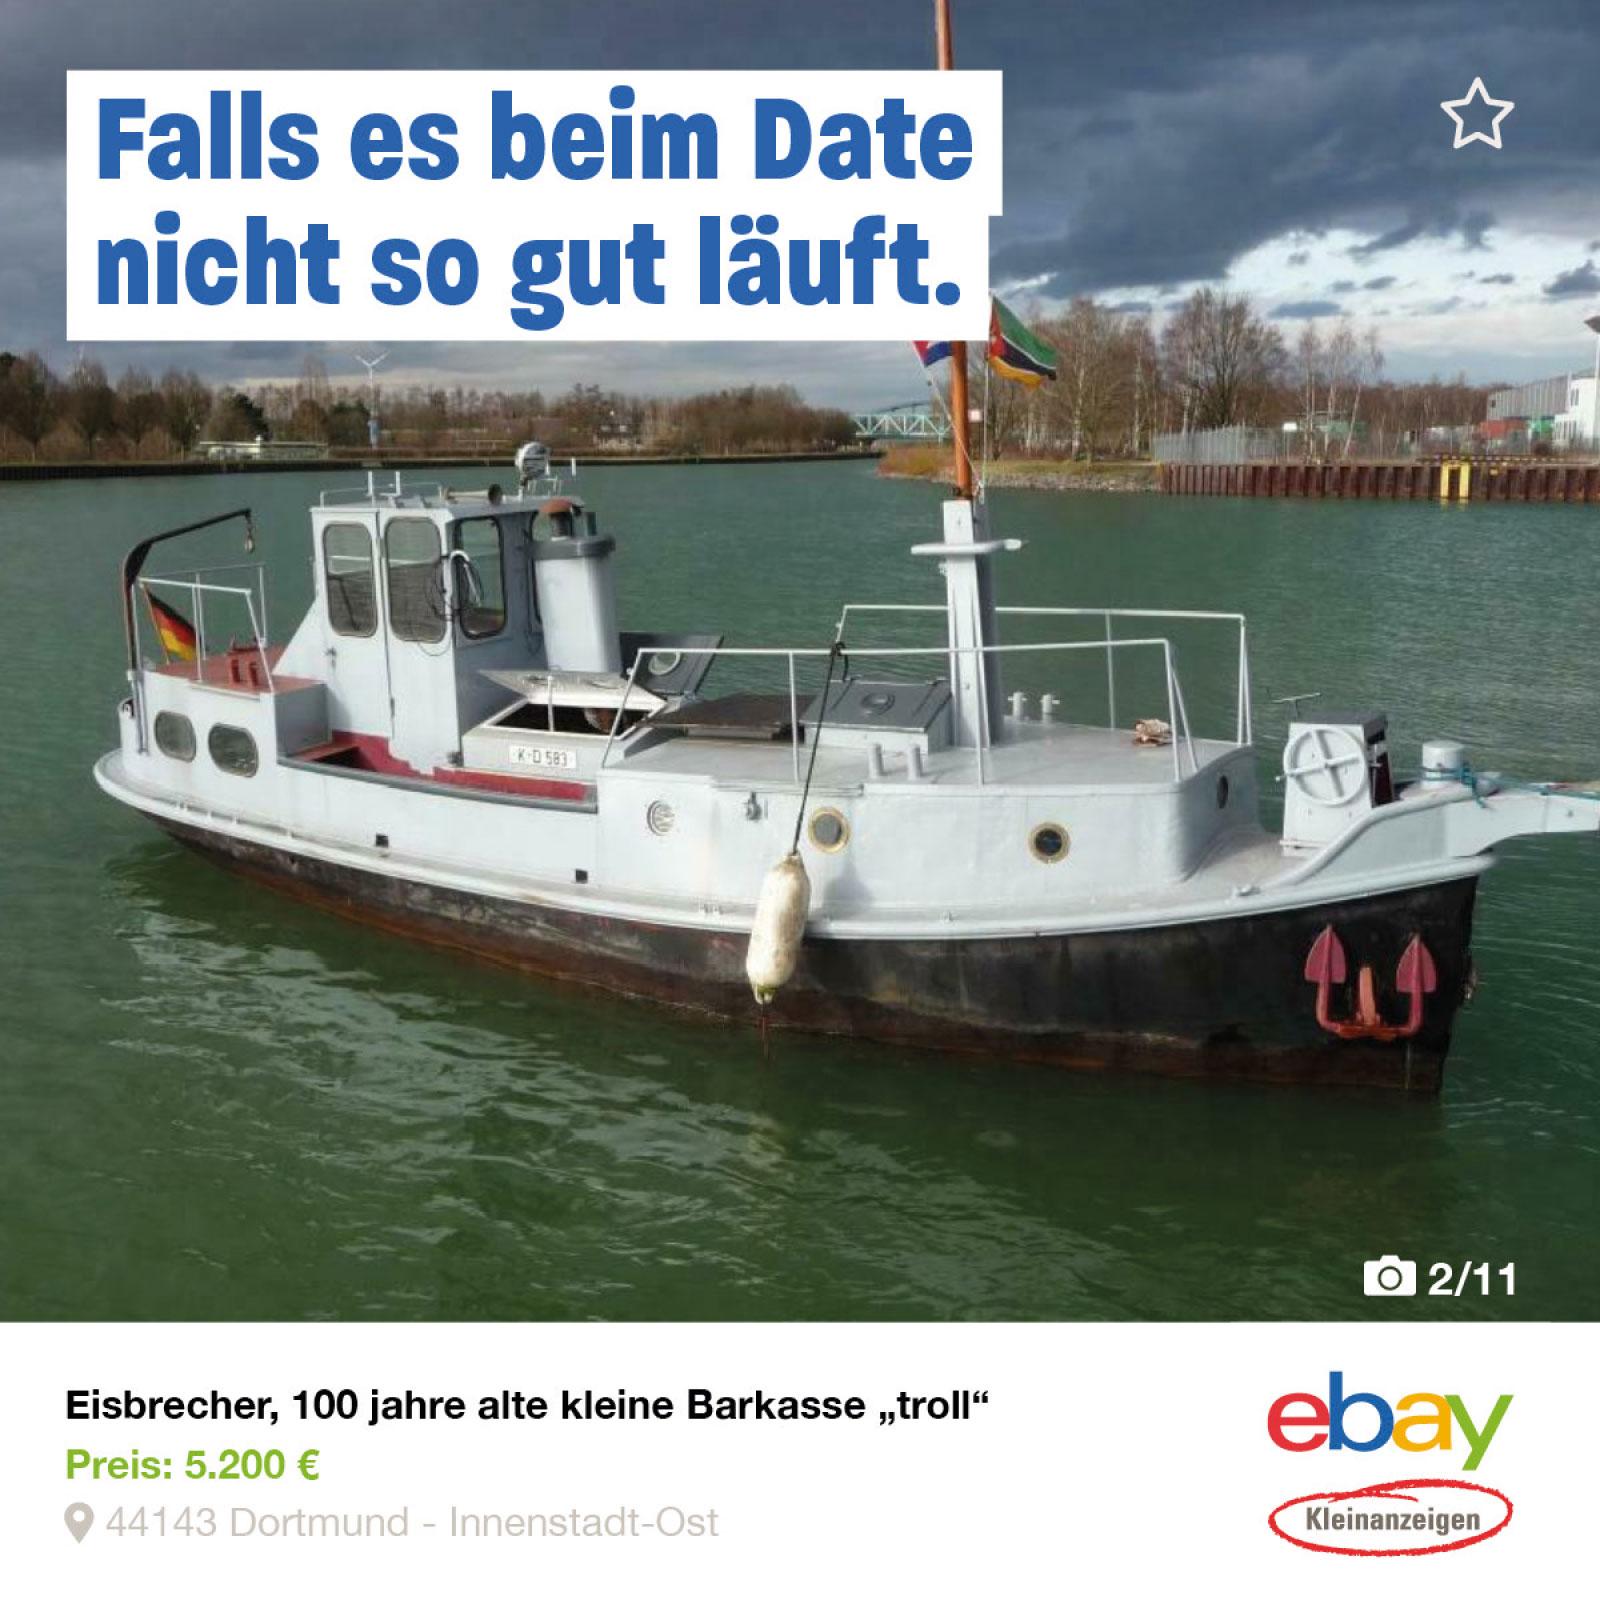 ebay_postings_14x14_rz_12